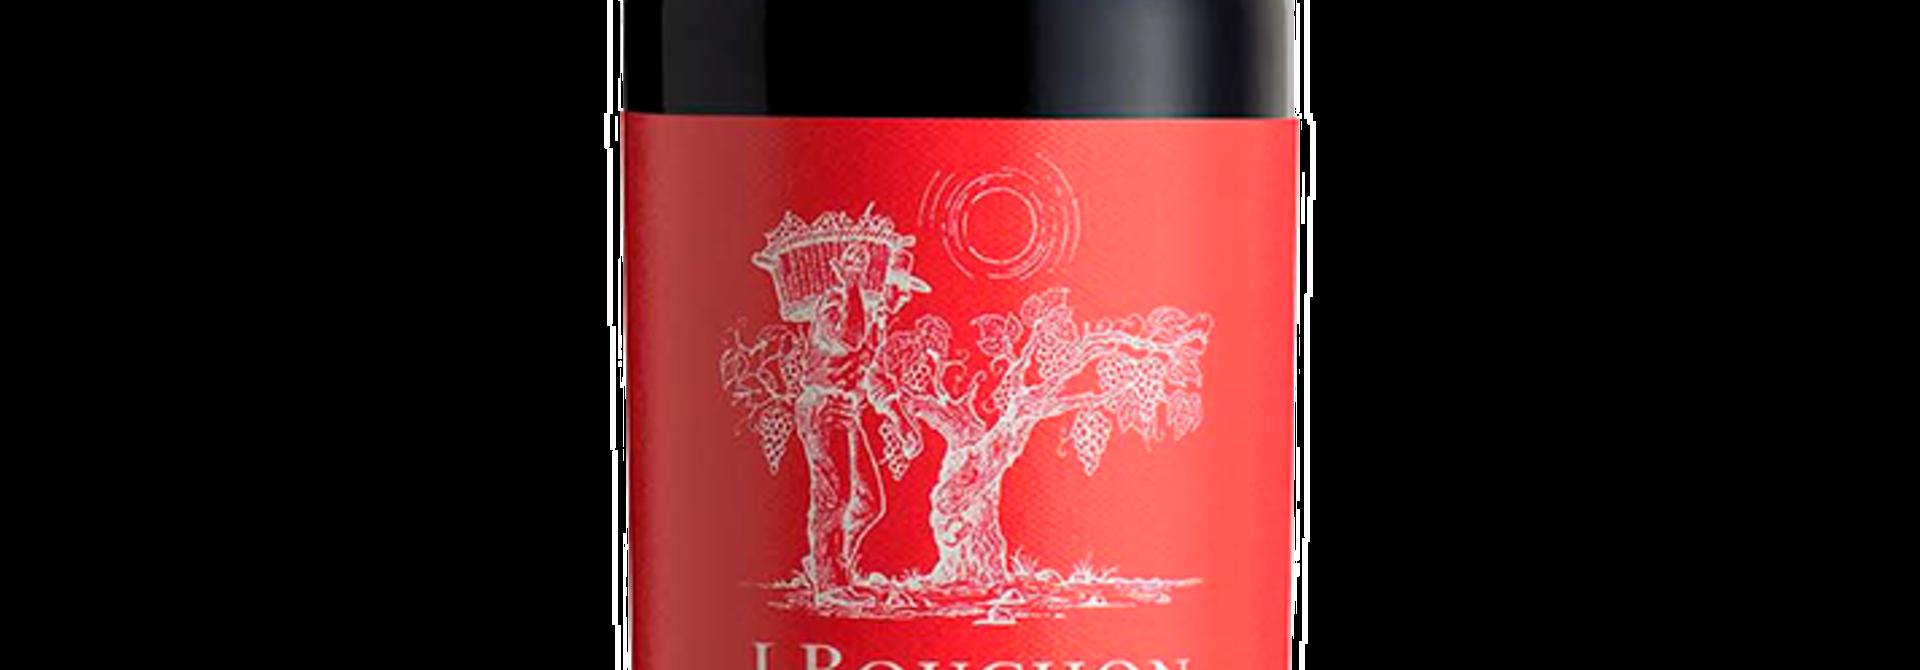 Cabernet Sauvignon Block series 2016, Bouchon